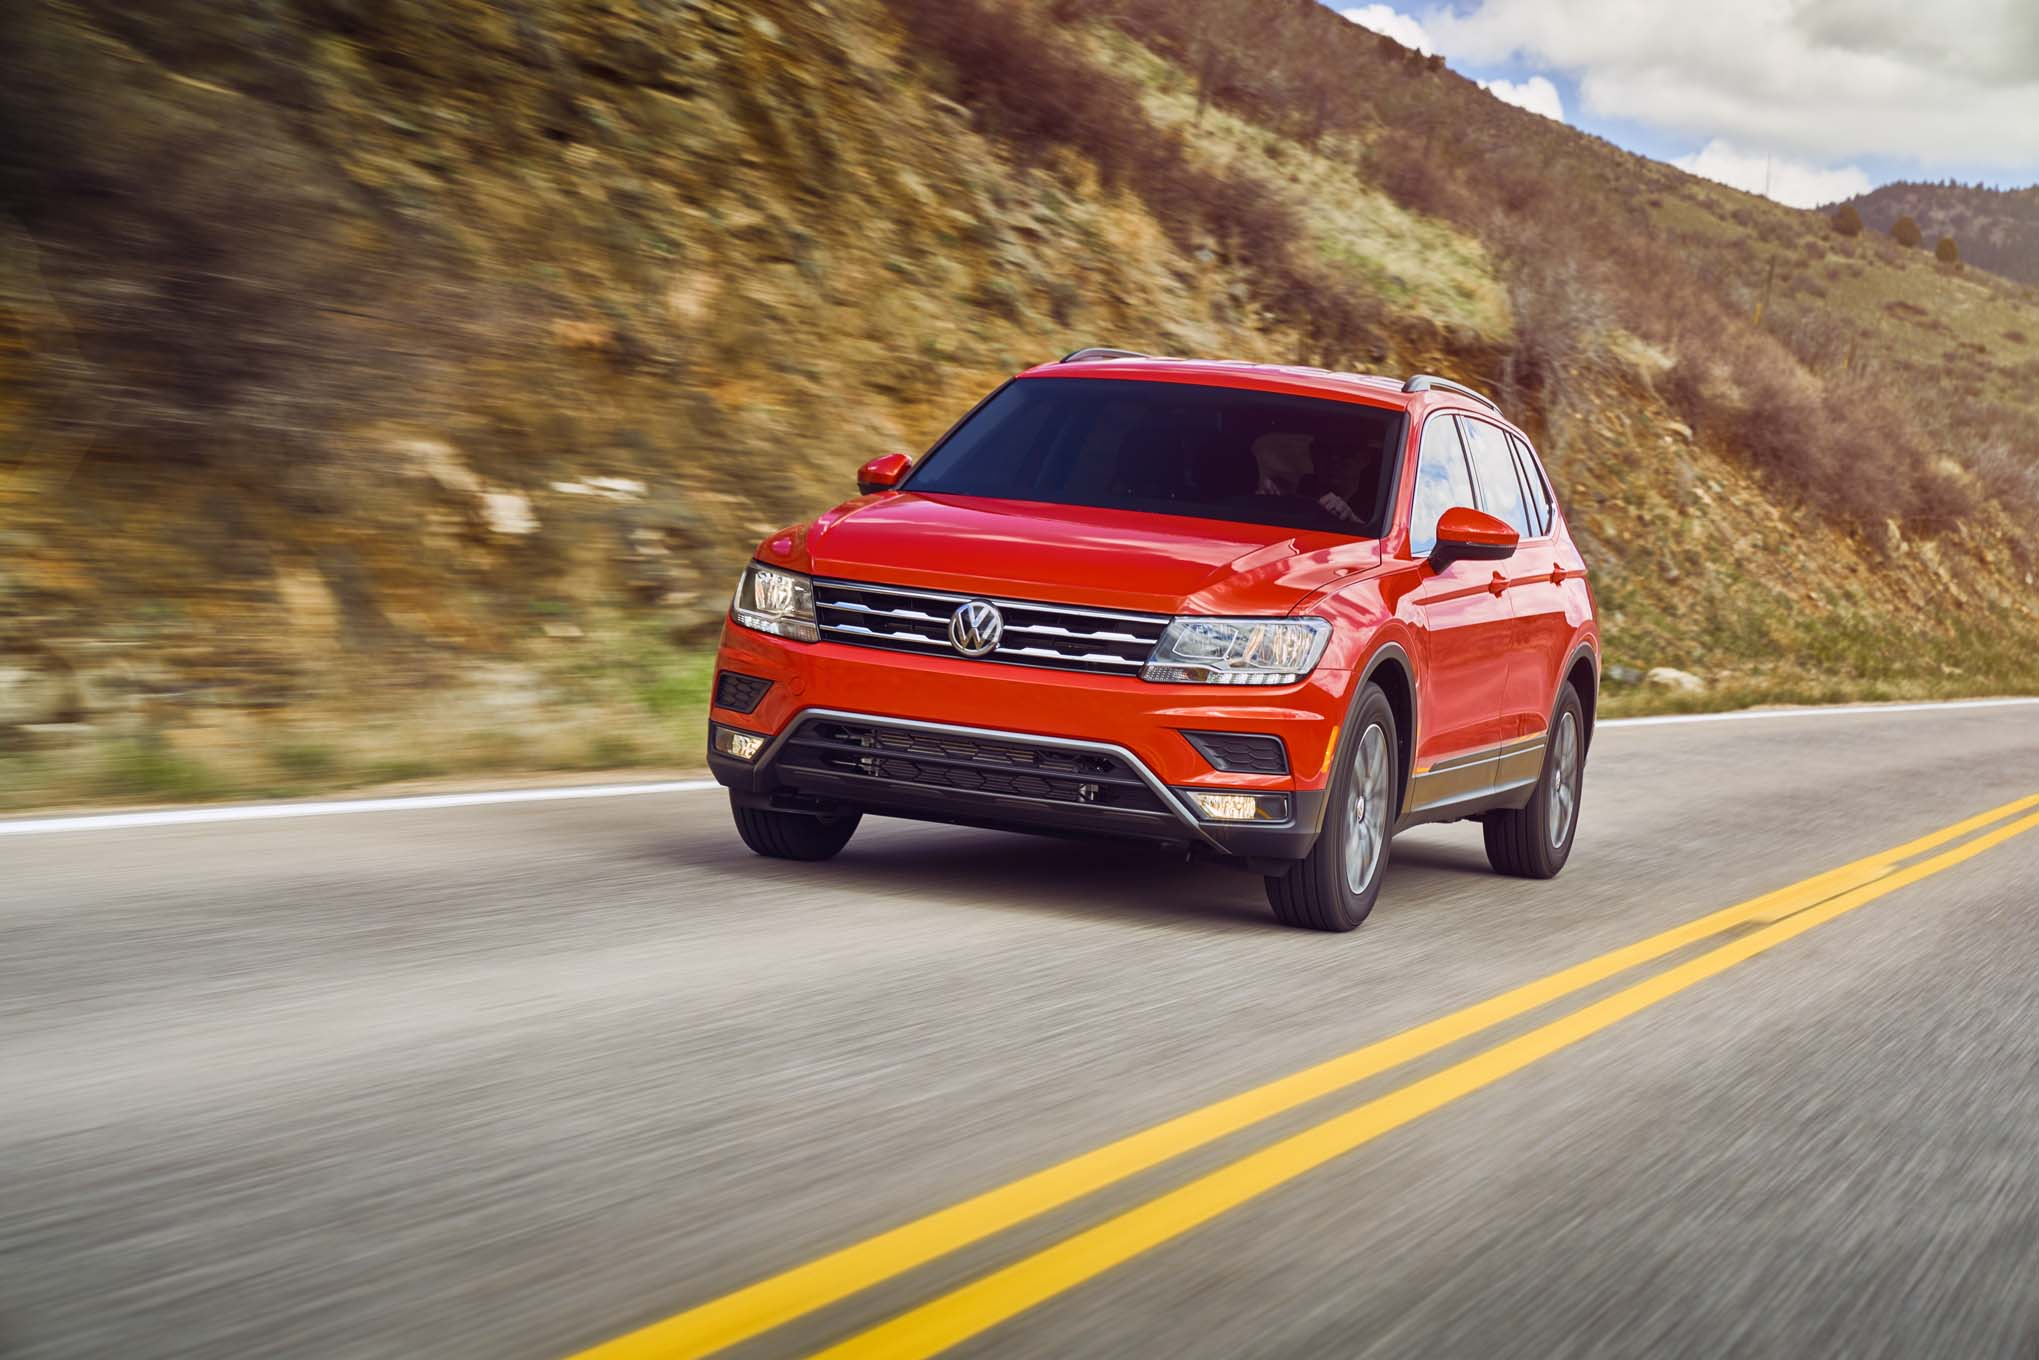 2018 Volkswagen Tiguan S Front Three Quarter In Motion